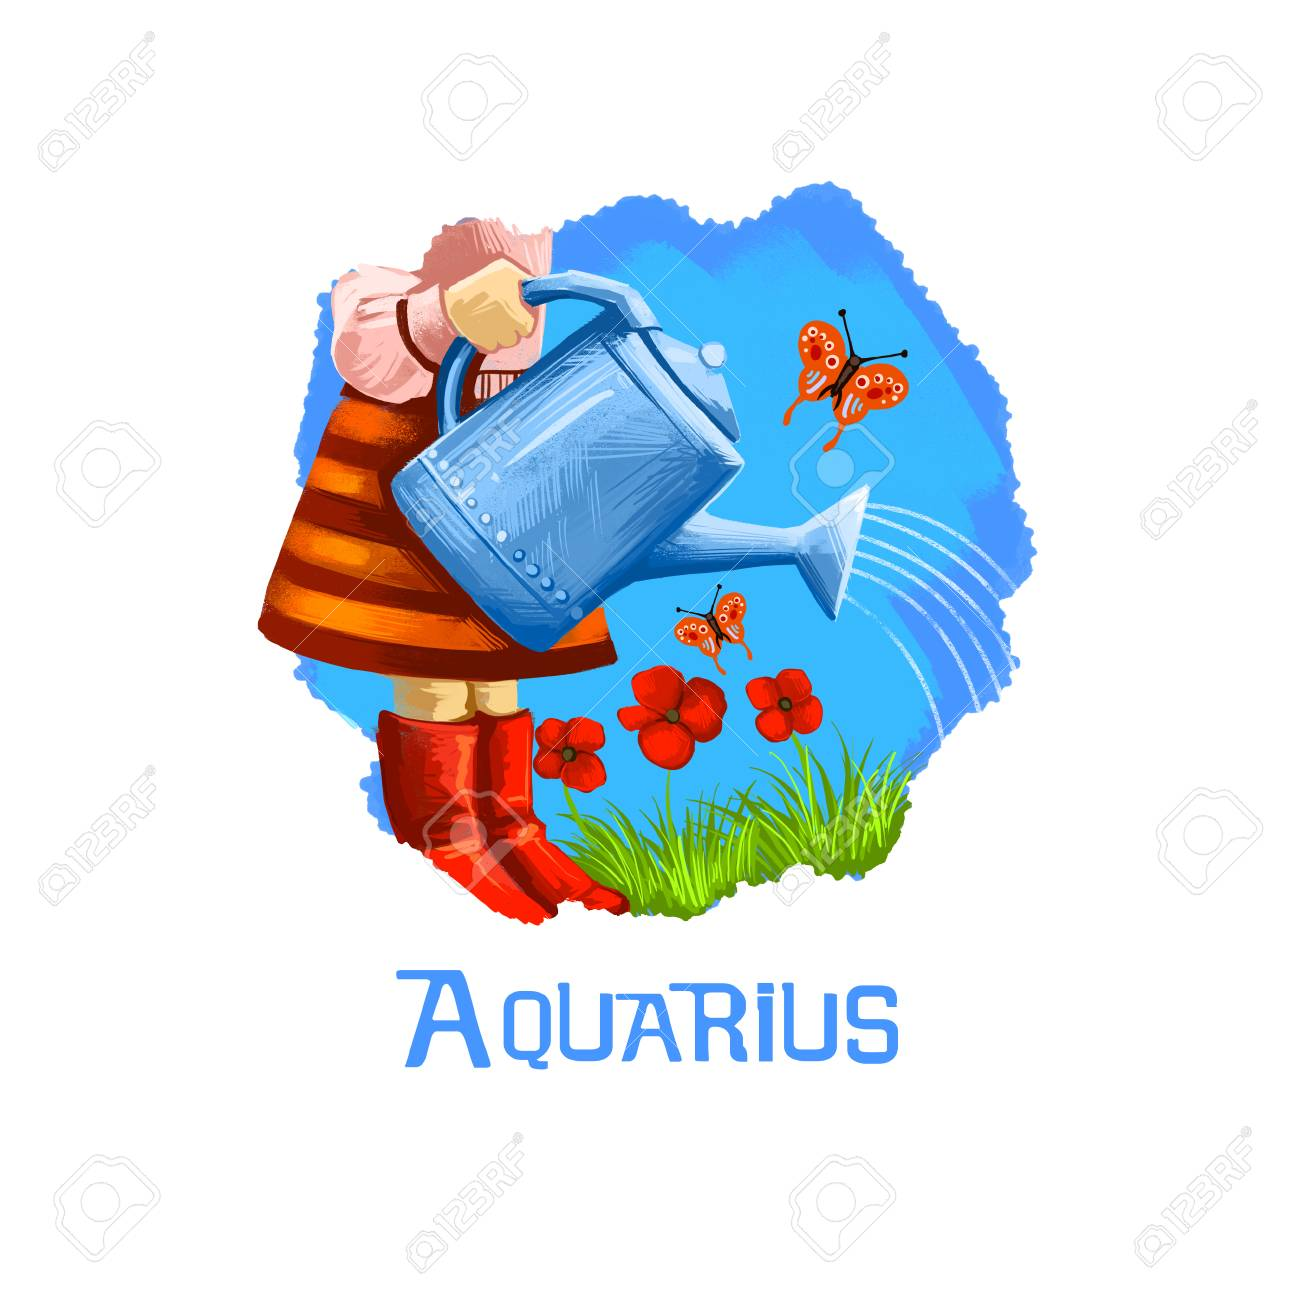 Aquarius horoscope sign with children digital art illustration aquarius horoscope sign with children digital art illustration isolated on white little girl pouring plants buycottarizona